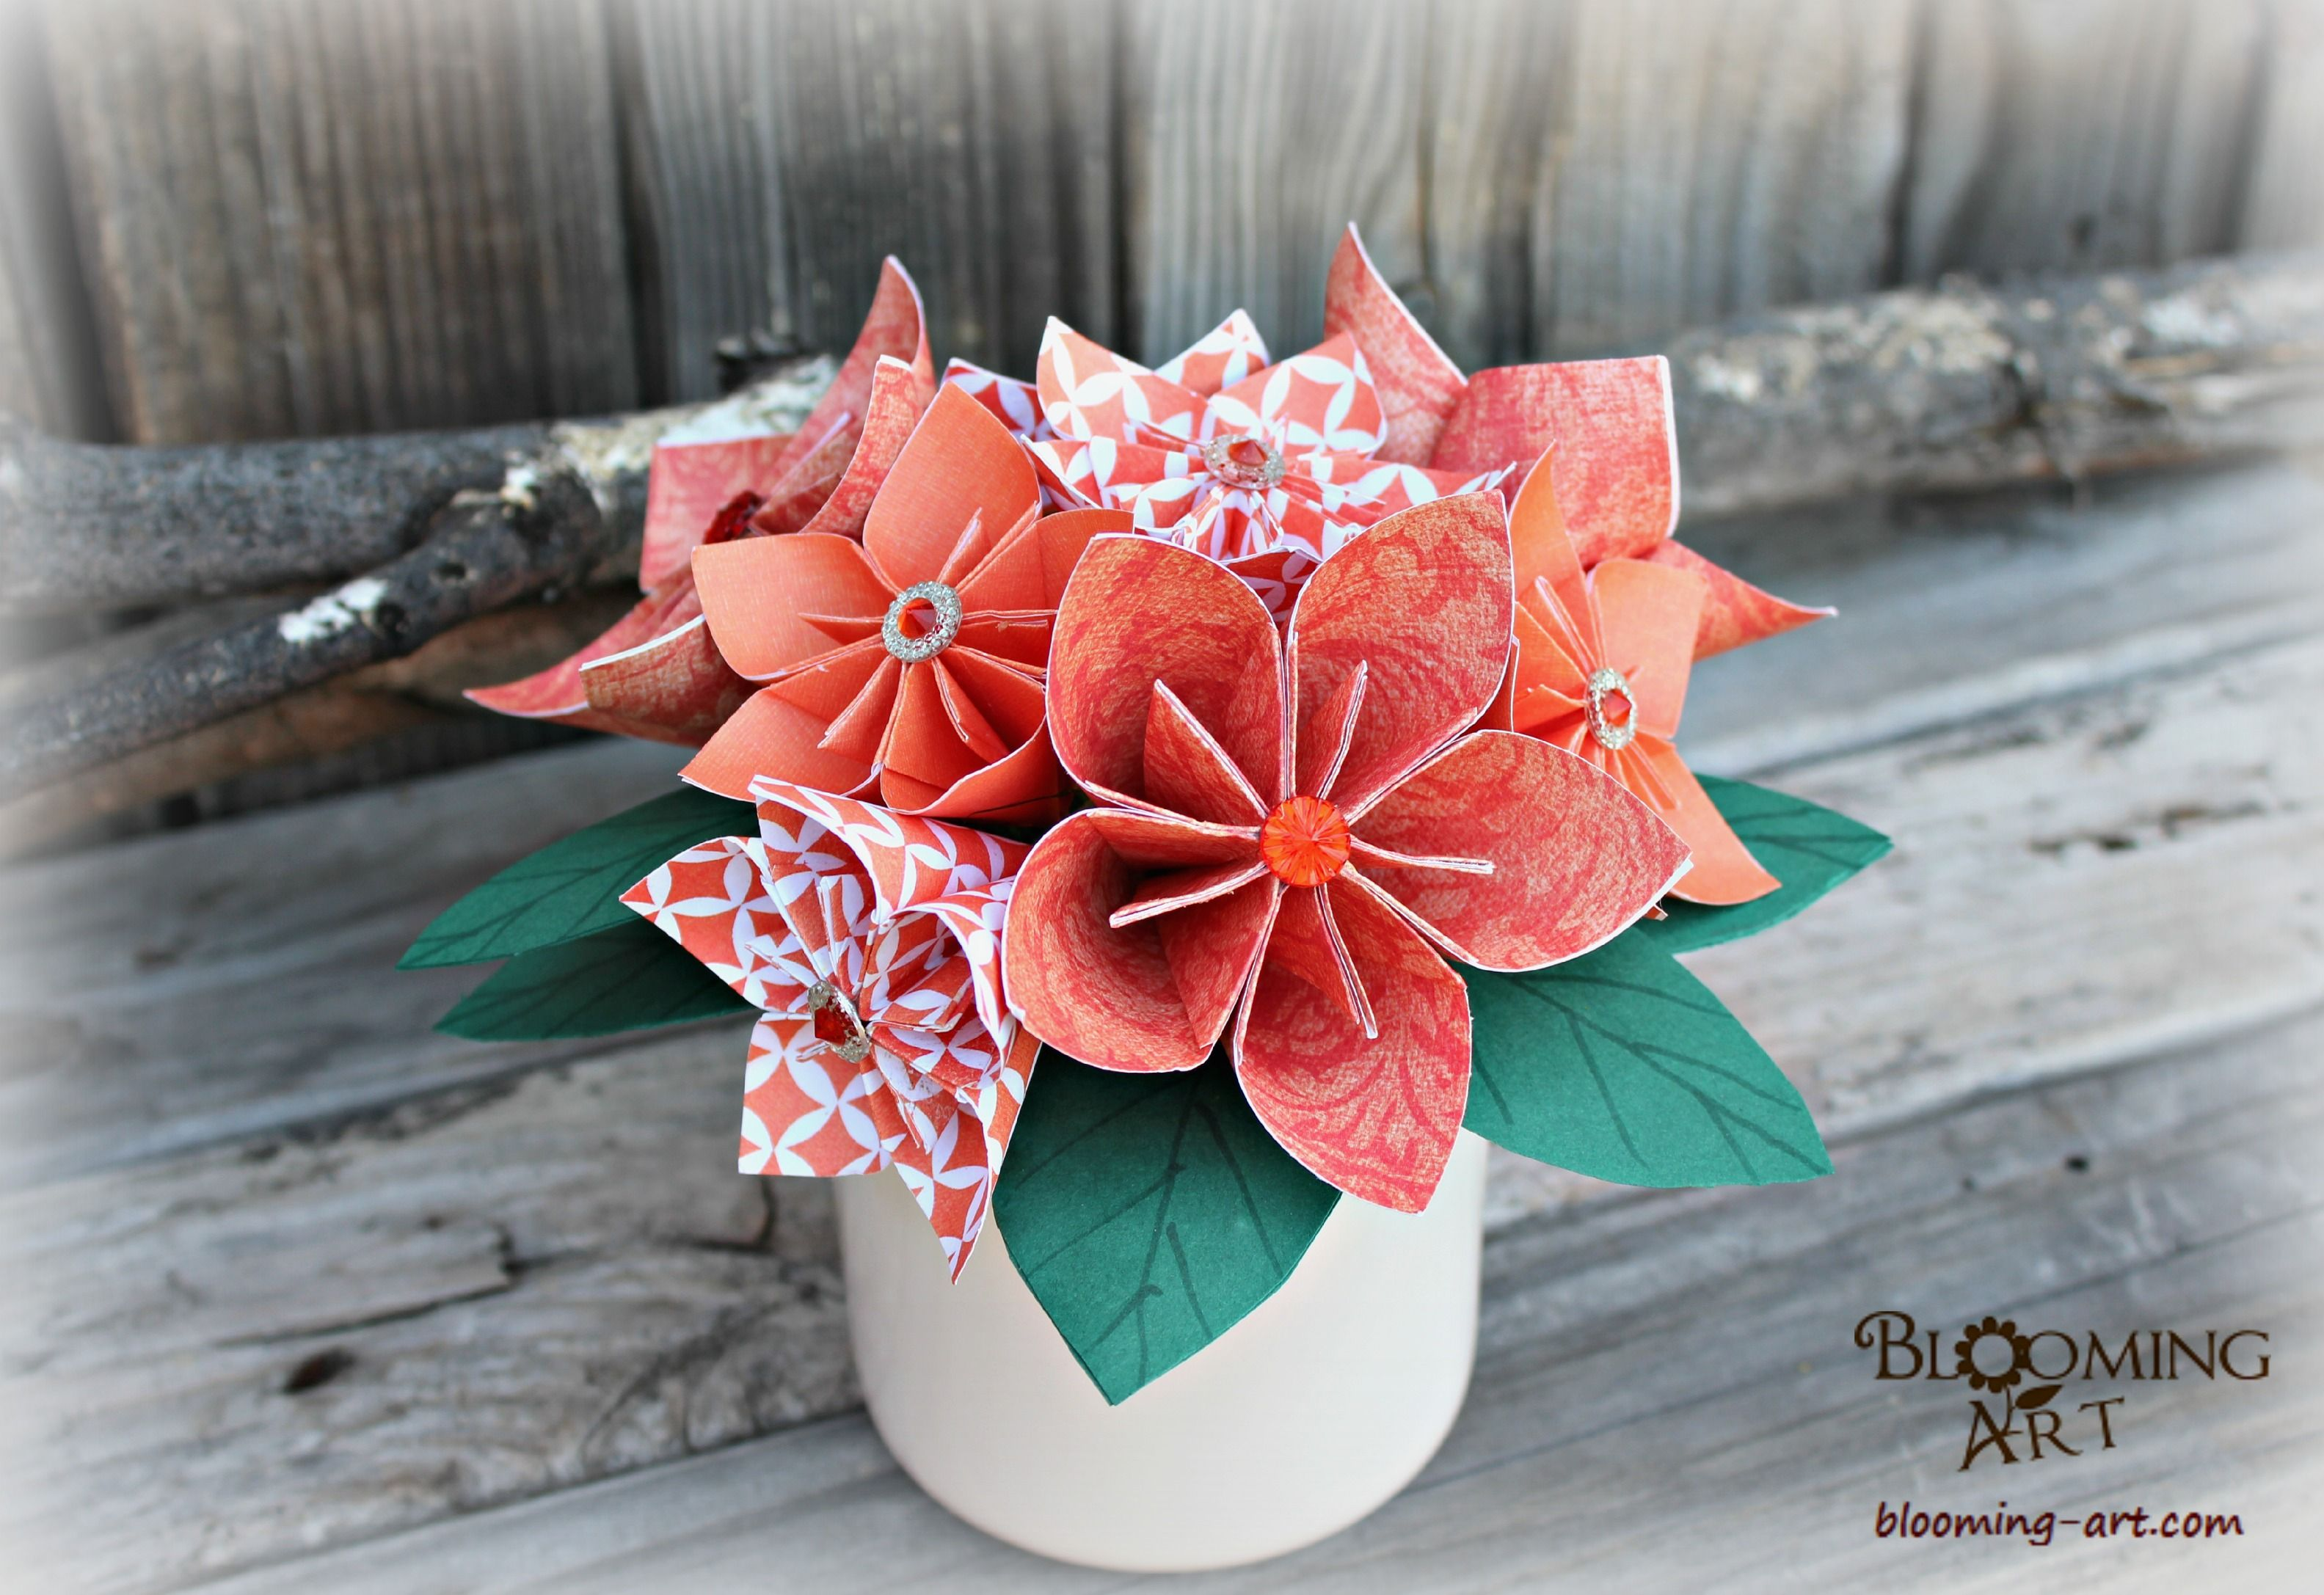 Orange kusudama paper flowers dont want real flowers for your orange kusudama paper flowers dont want real flowers for your special event mightylinksfo